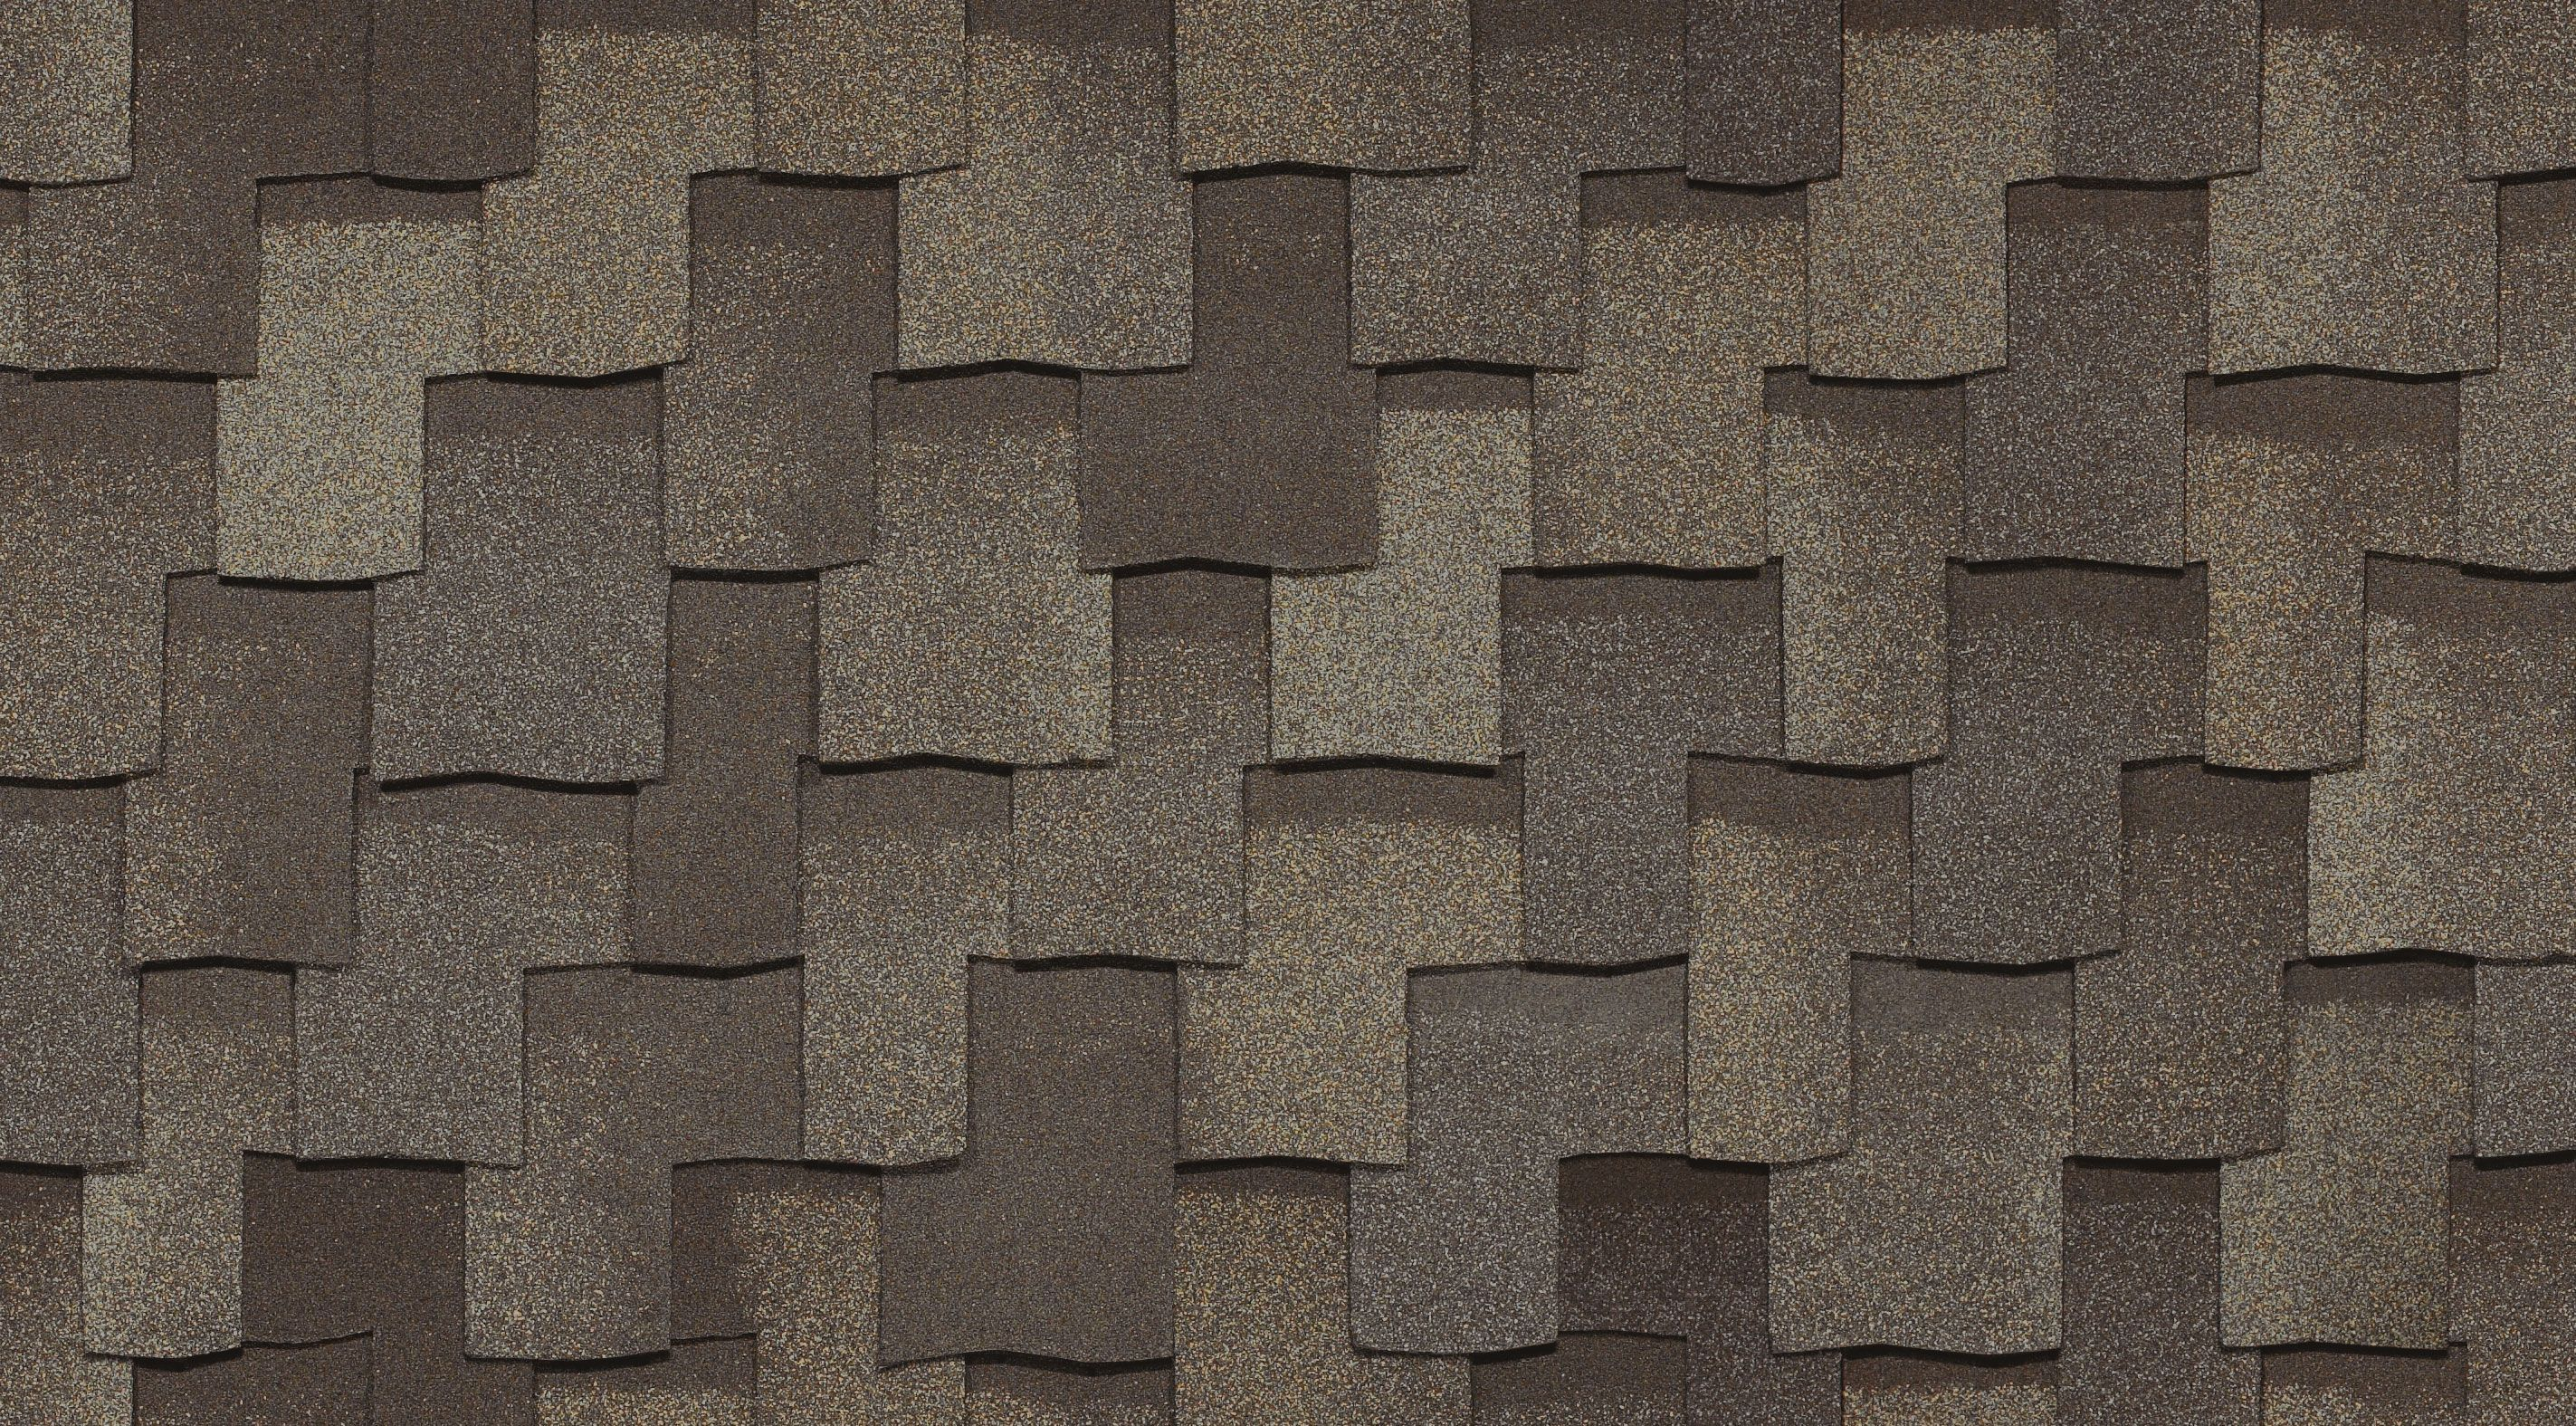 Armourshake Premium Roof Shingles Asphalt Dimensional Shingles Iko In 2020 Dimensional Shingles Roof Shingles Residential Roofing Shingles